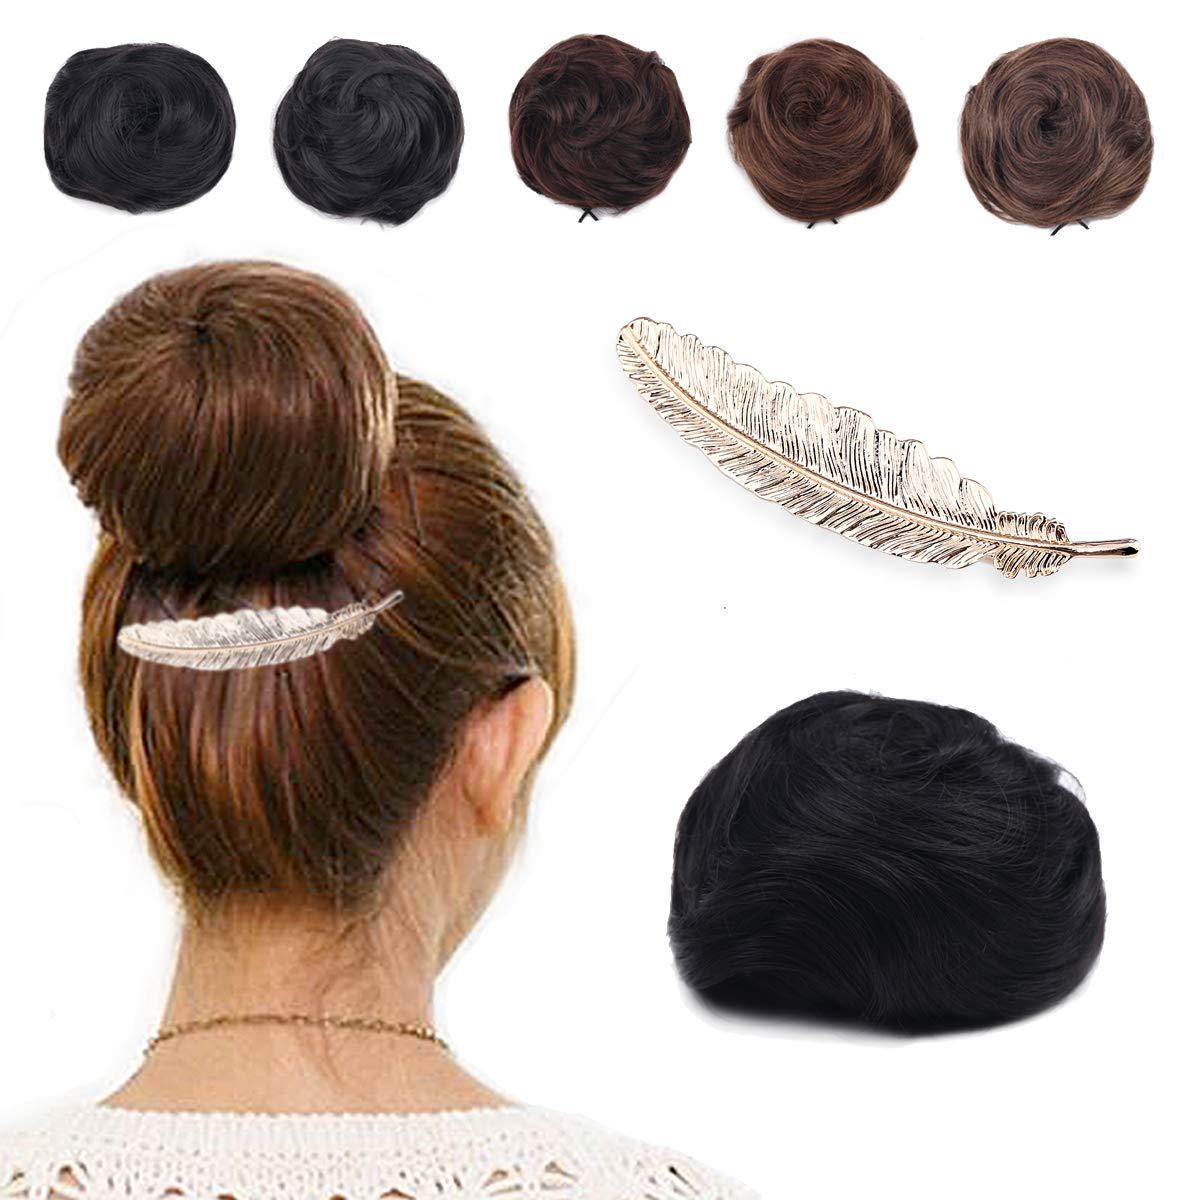 BLUEBUBBLE Synthetic Fibre Hair Bun Extension Elastic Scrunchies Ponytail Hairpieces Donut Chignon Bun Hair Updo Wig For Girls Women Teens Hair Clip Barrette-Free